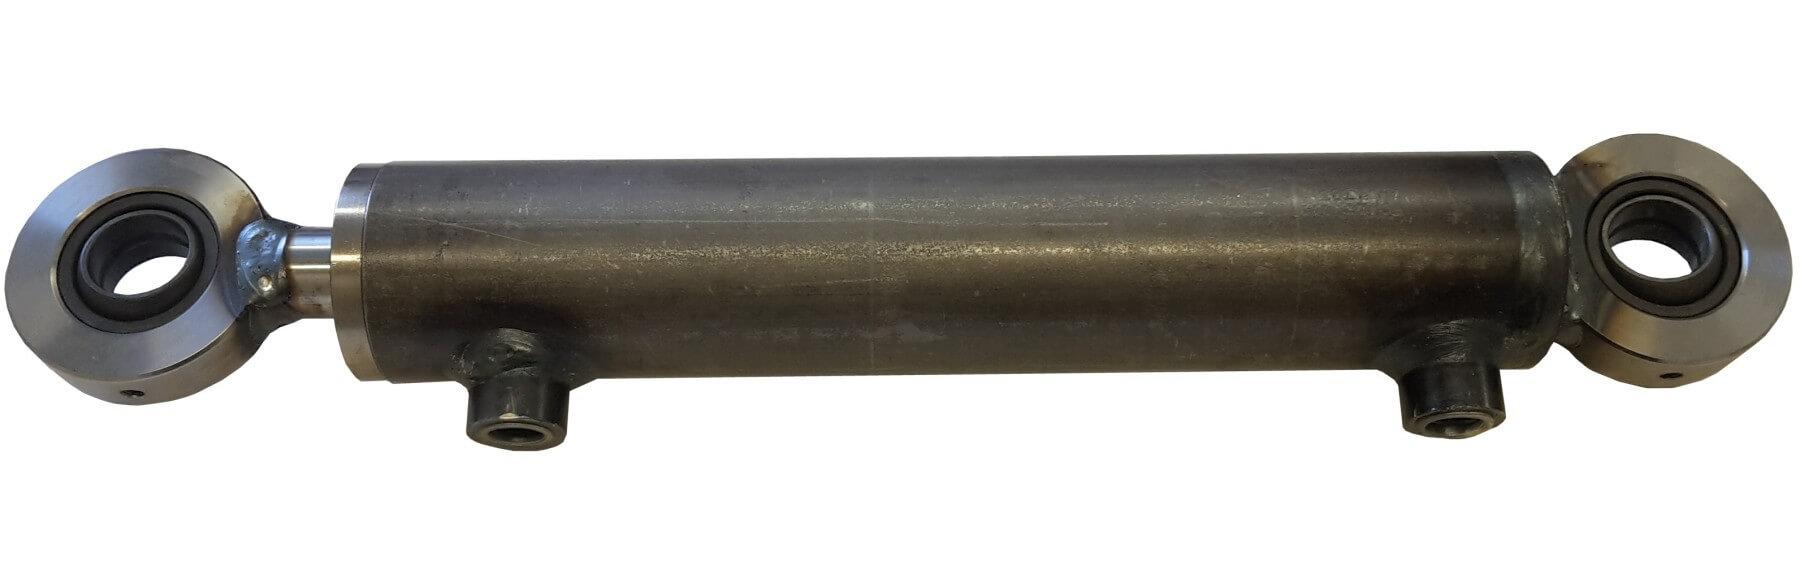 Hydraulisylinteri CL 40. 20. 400 GE